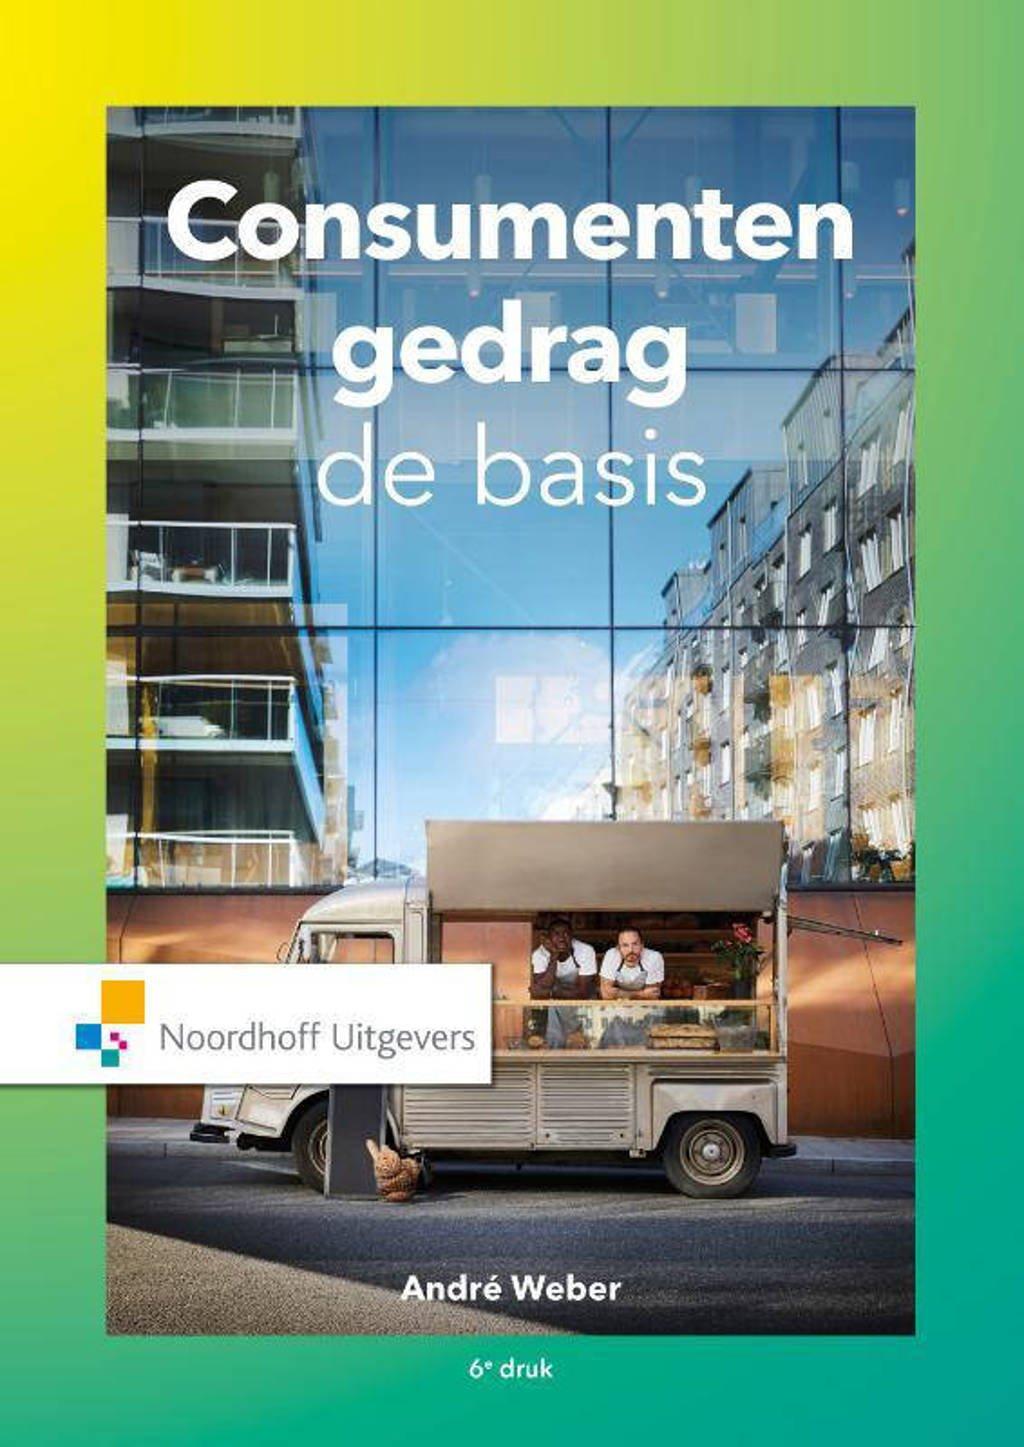 Consumentengedrag, de basis - André Weber